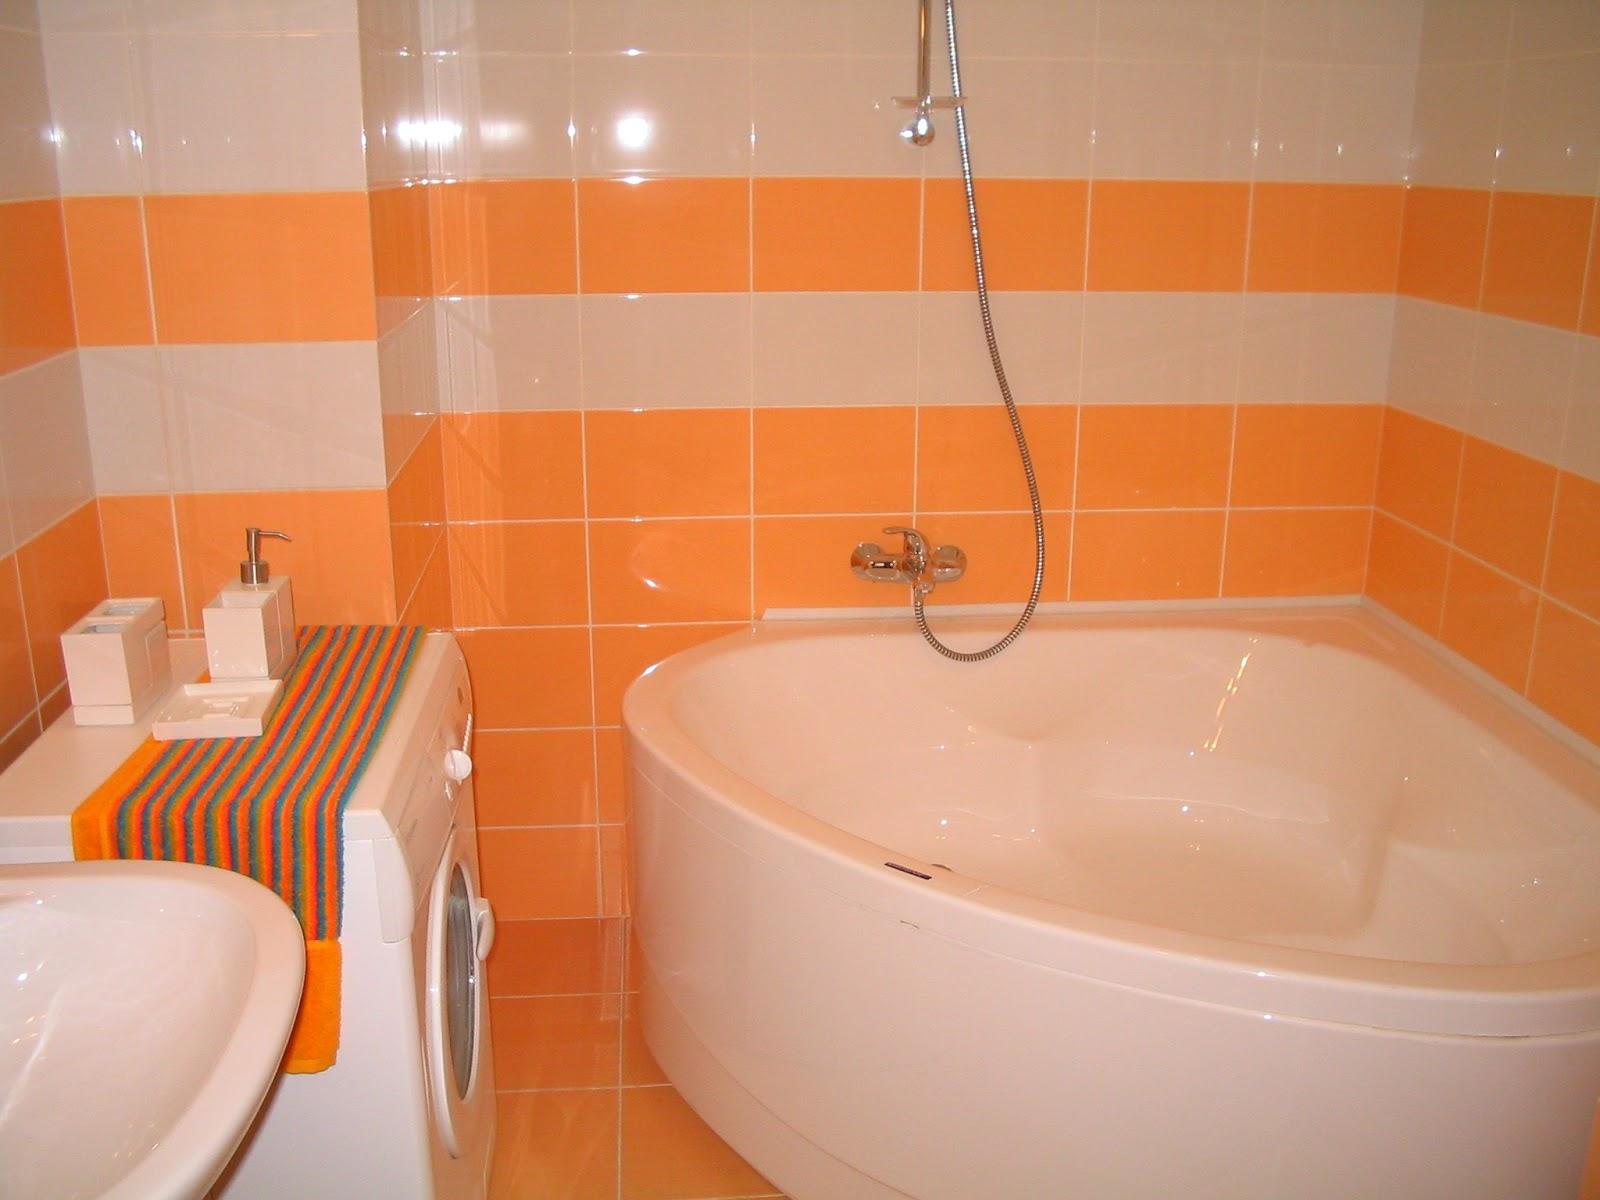 بالصور ديكورات الحمامات , اروع صور لديكورات الحمامات 5870 3